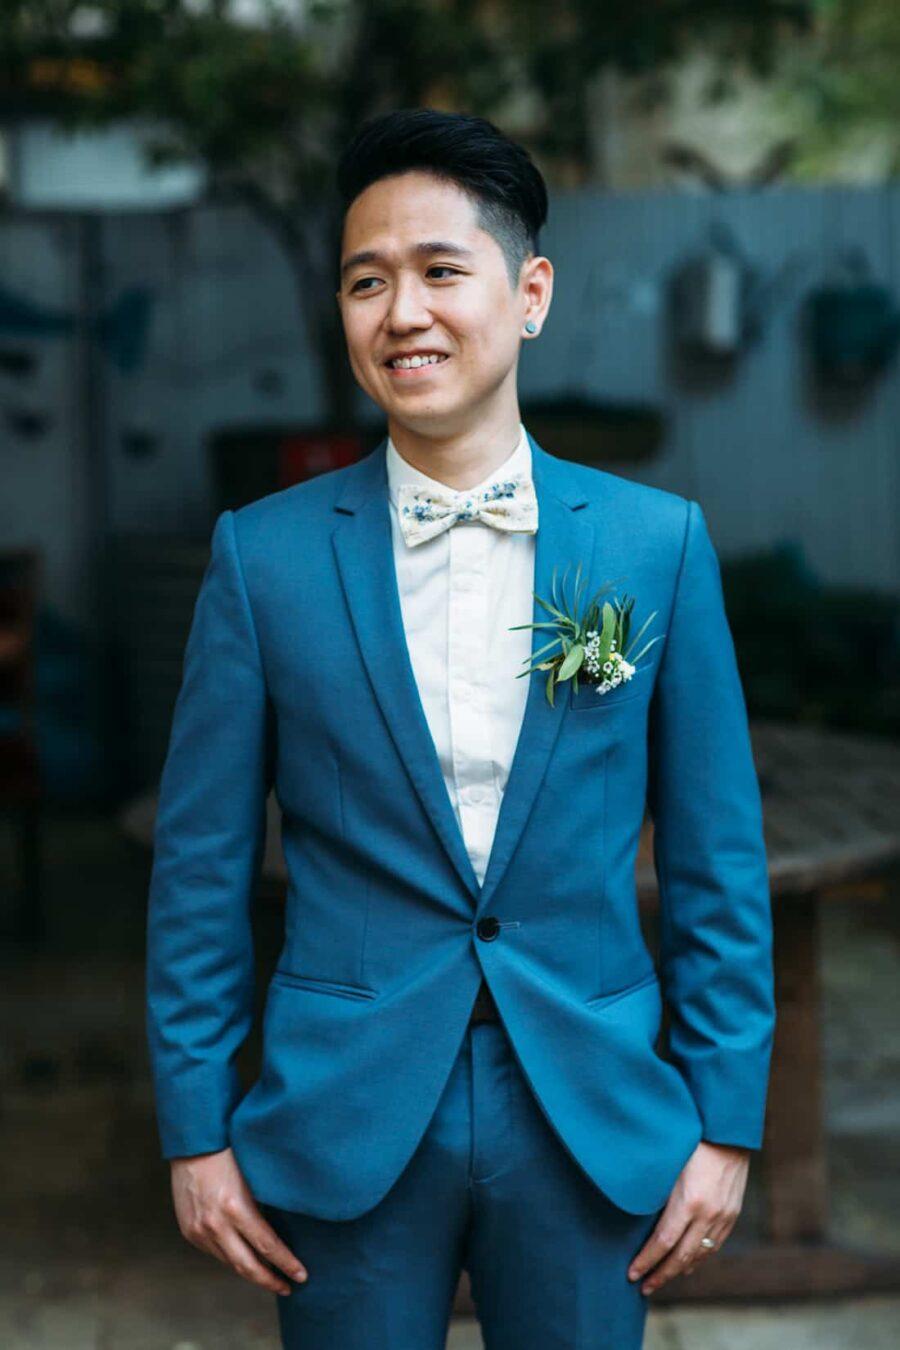 Fremantle weddgroom in cobalt blue suit with floral bow tie